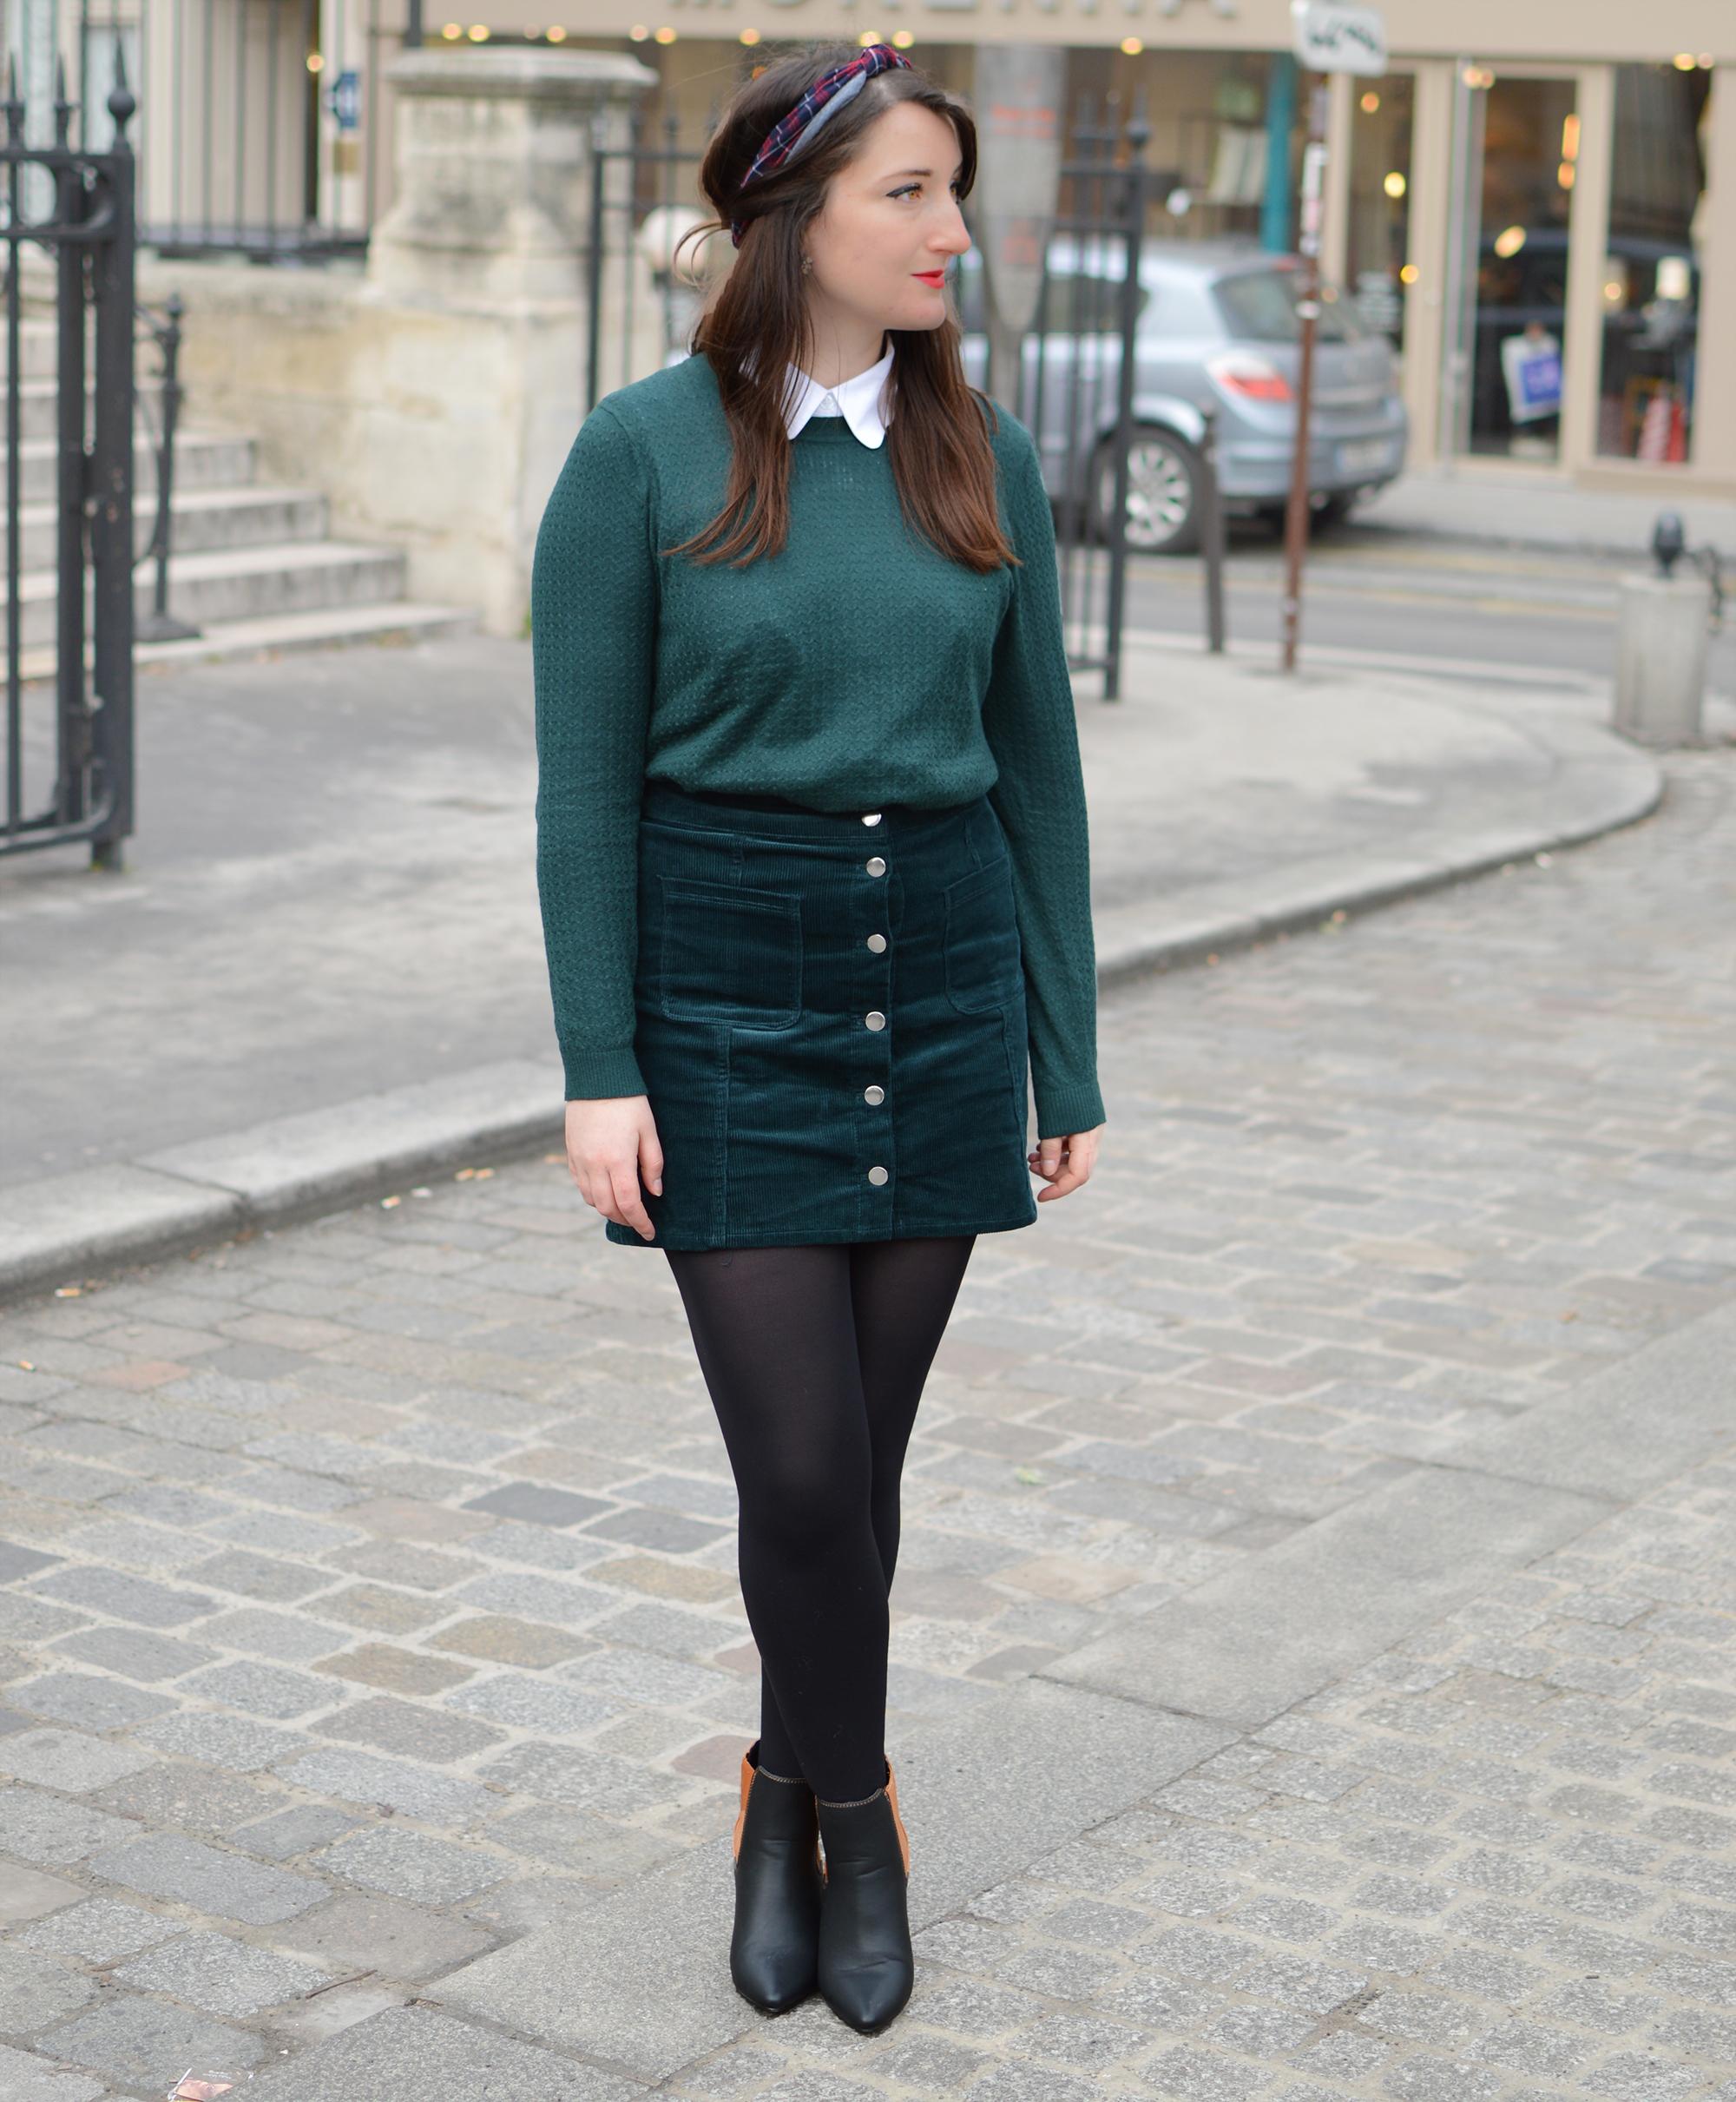 vert-sapin-jupe-col-festonne-look-3